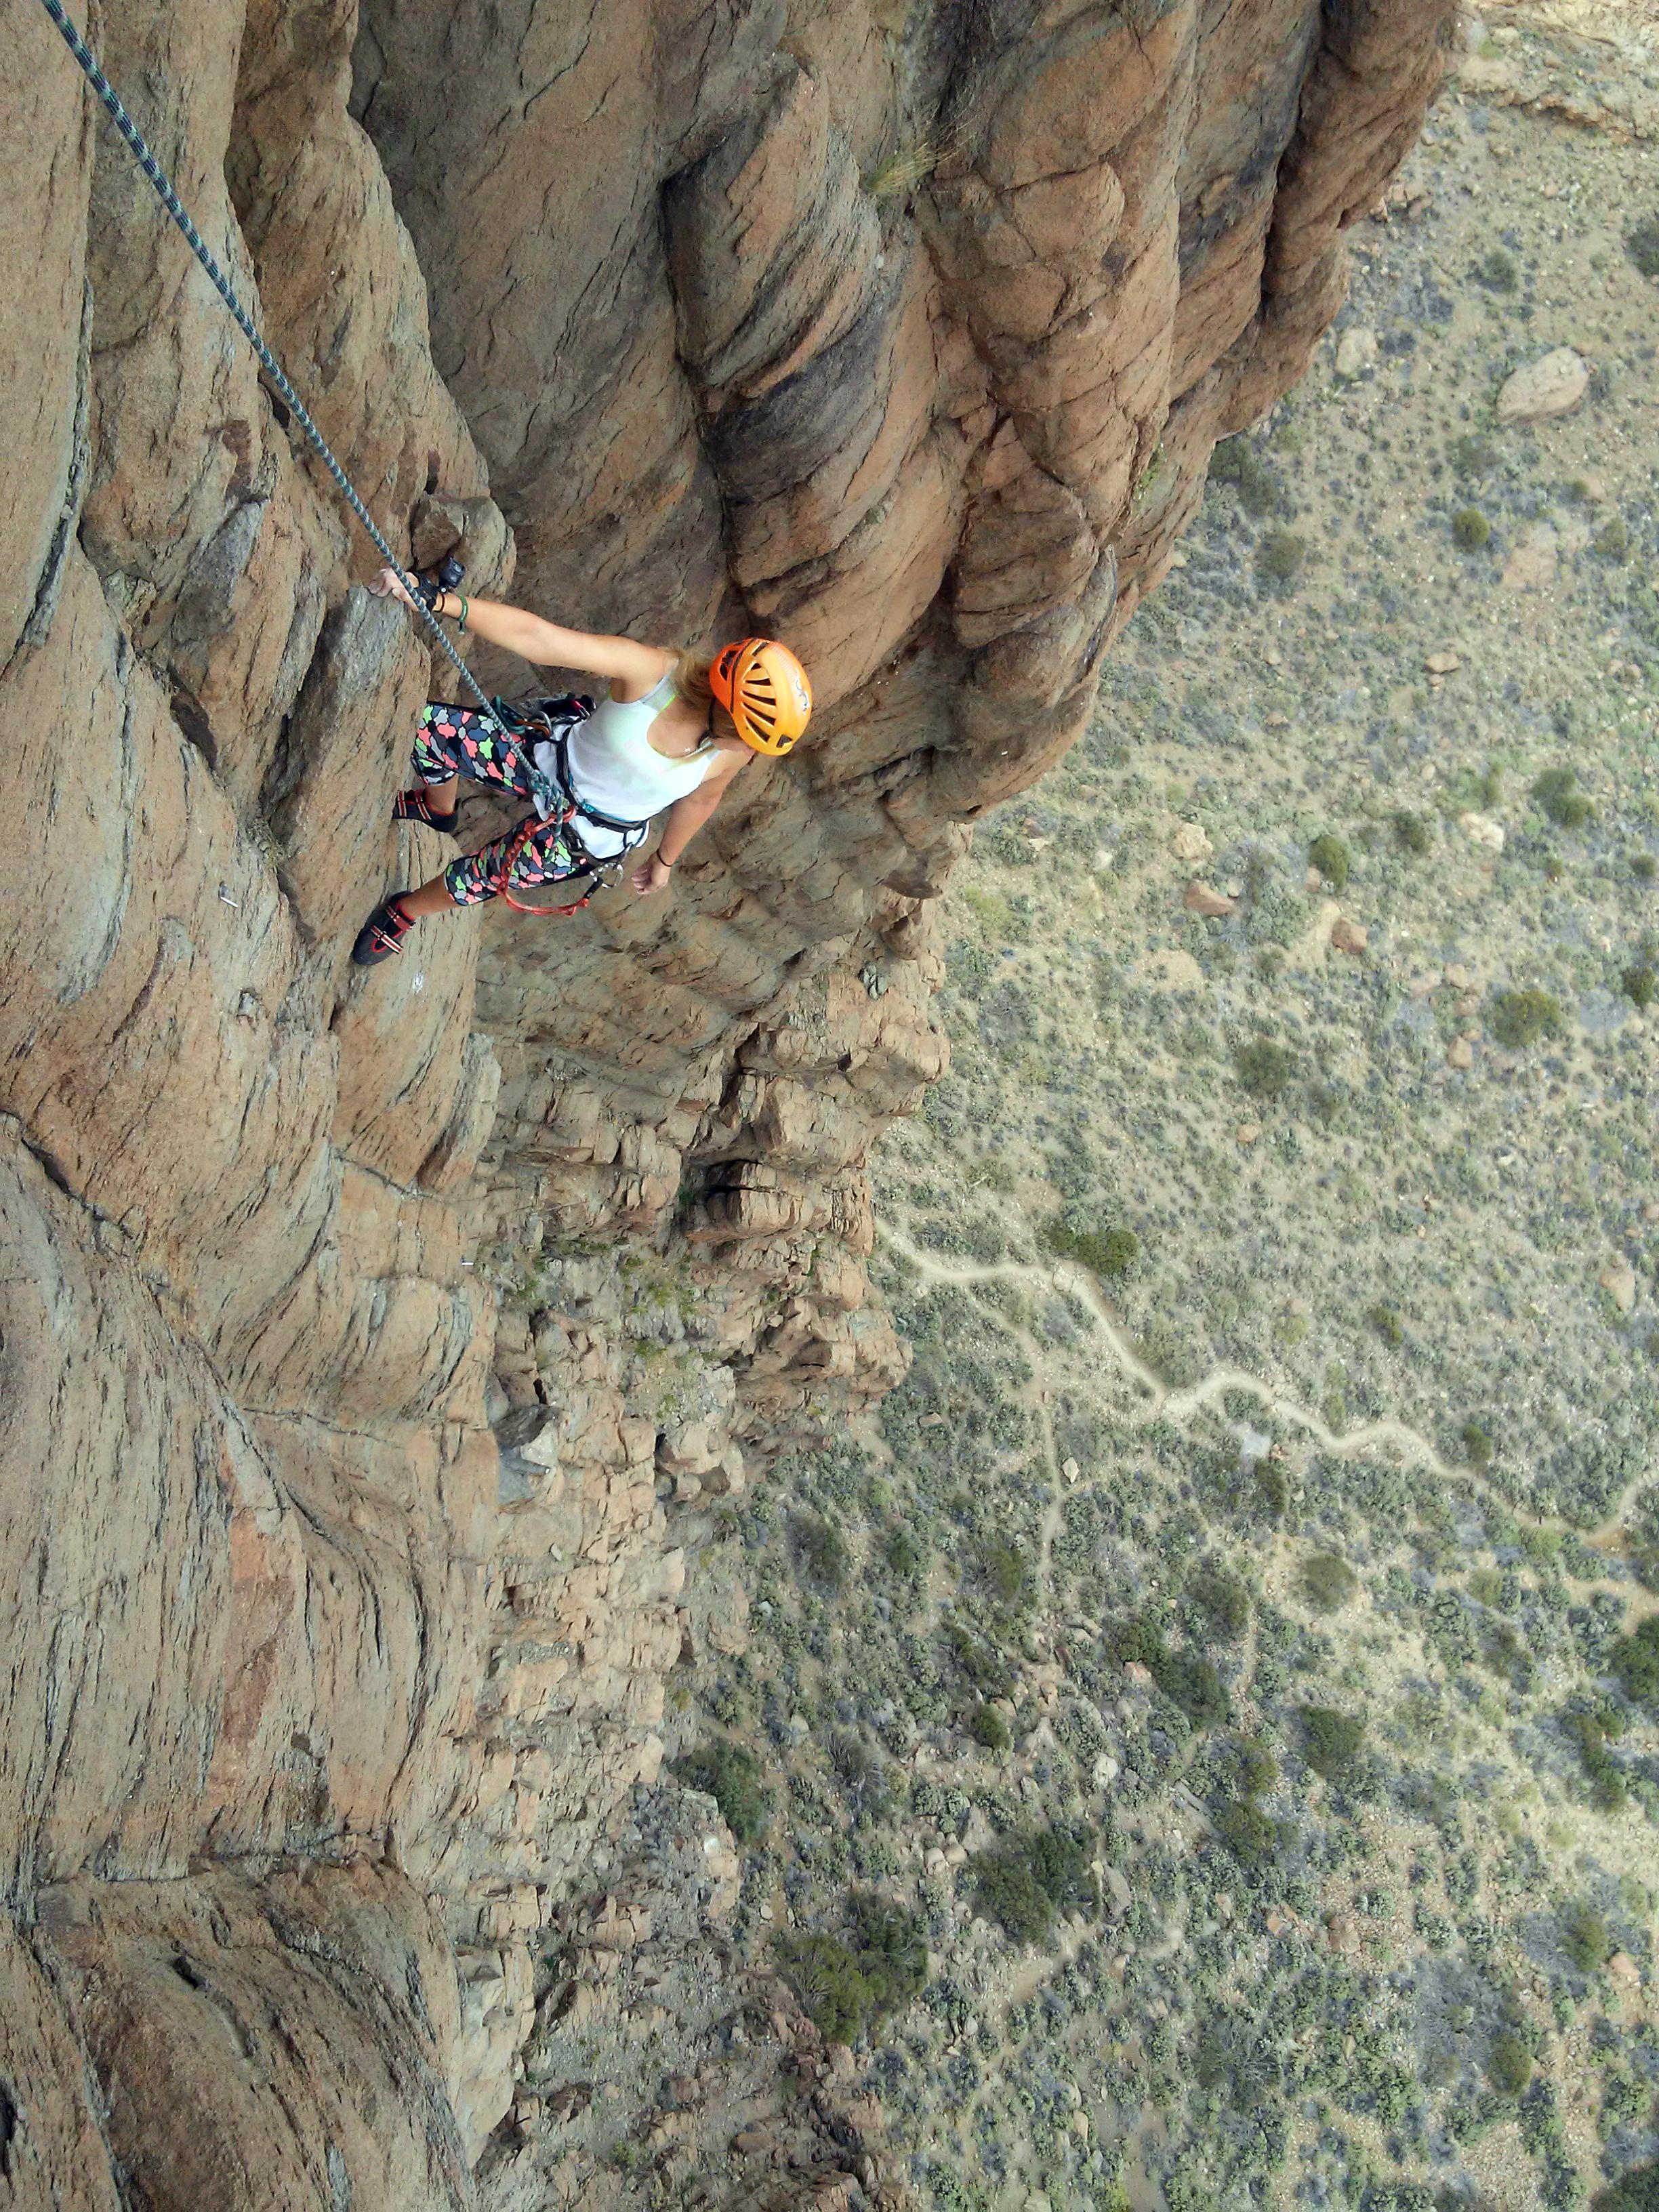 Tenerife rock climbing Adventures, Sophie Radcliffe, One Life, Live It